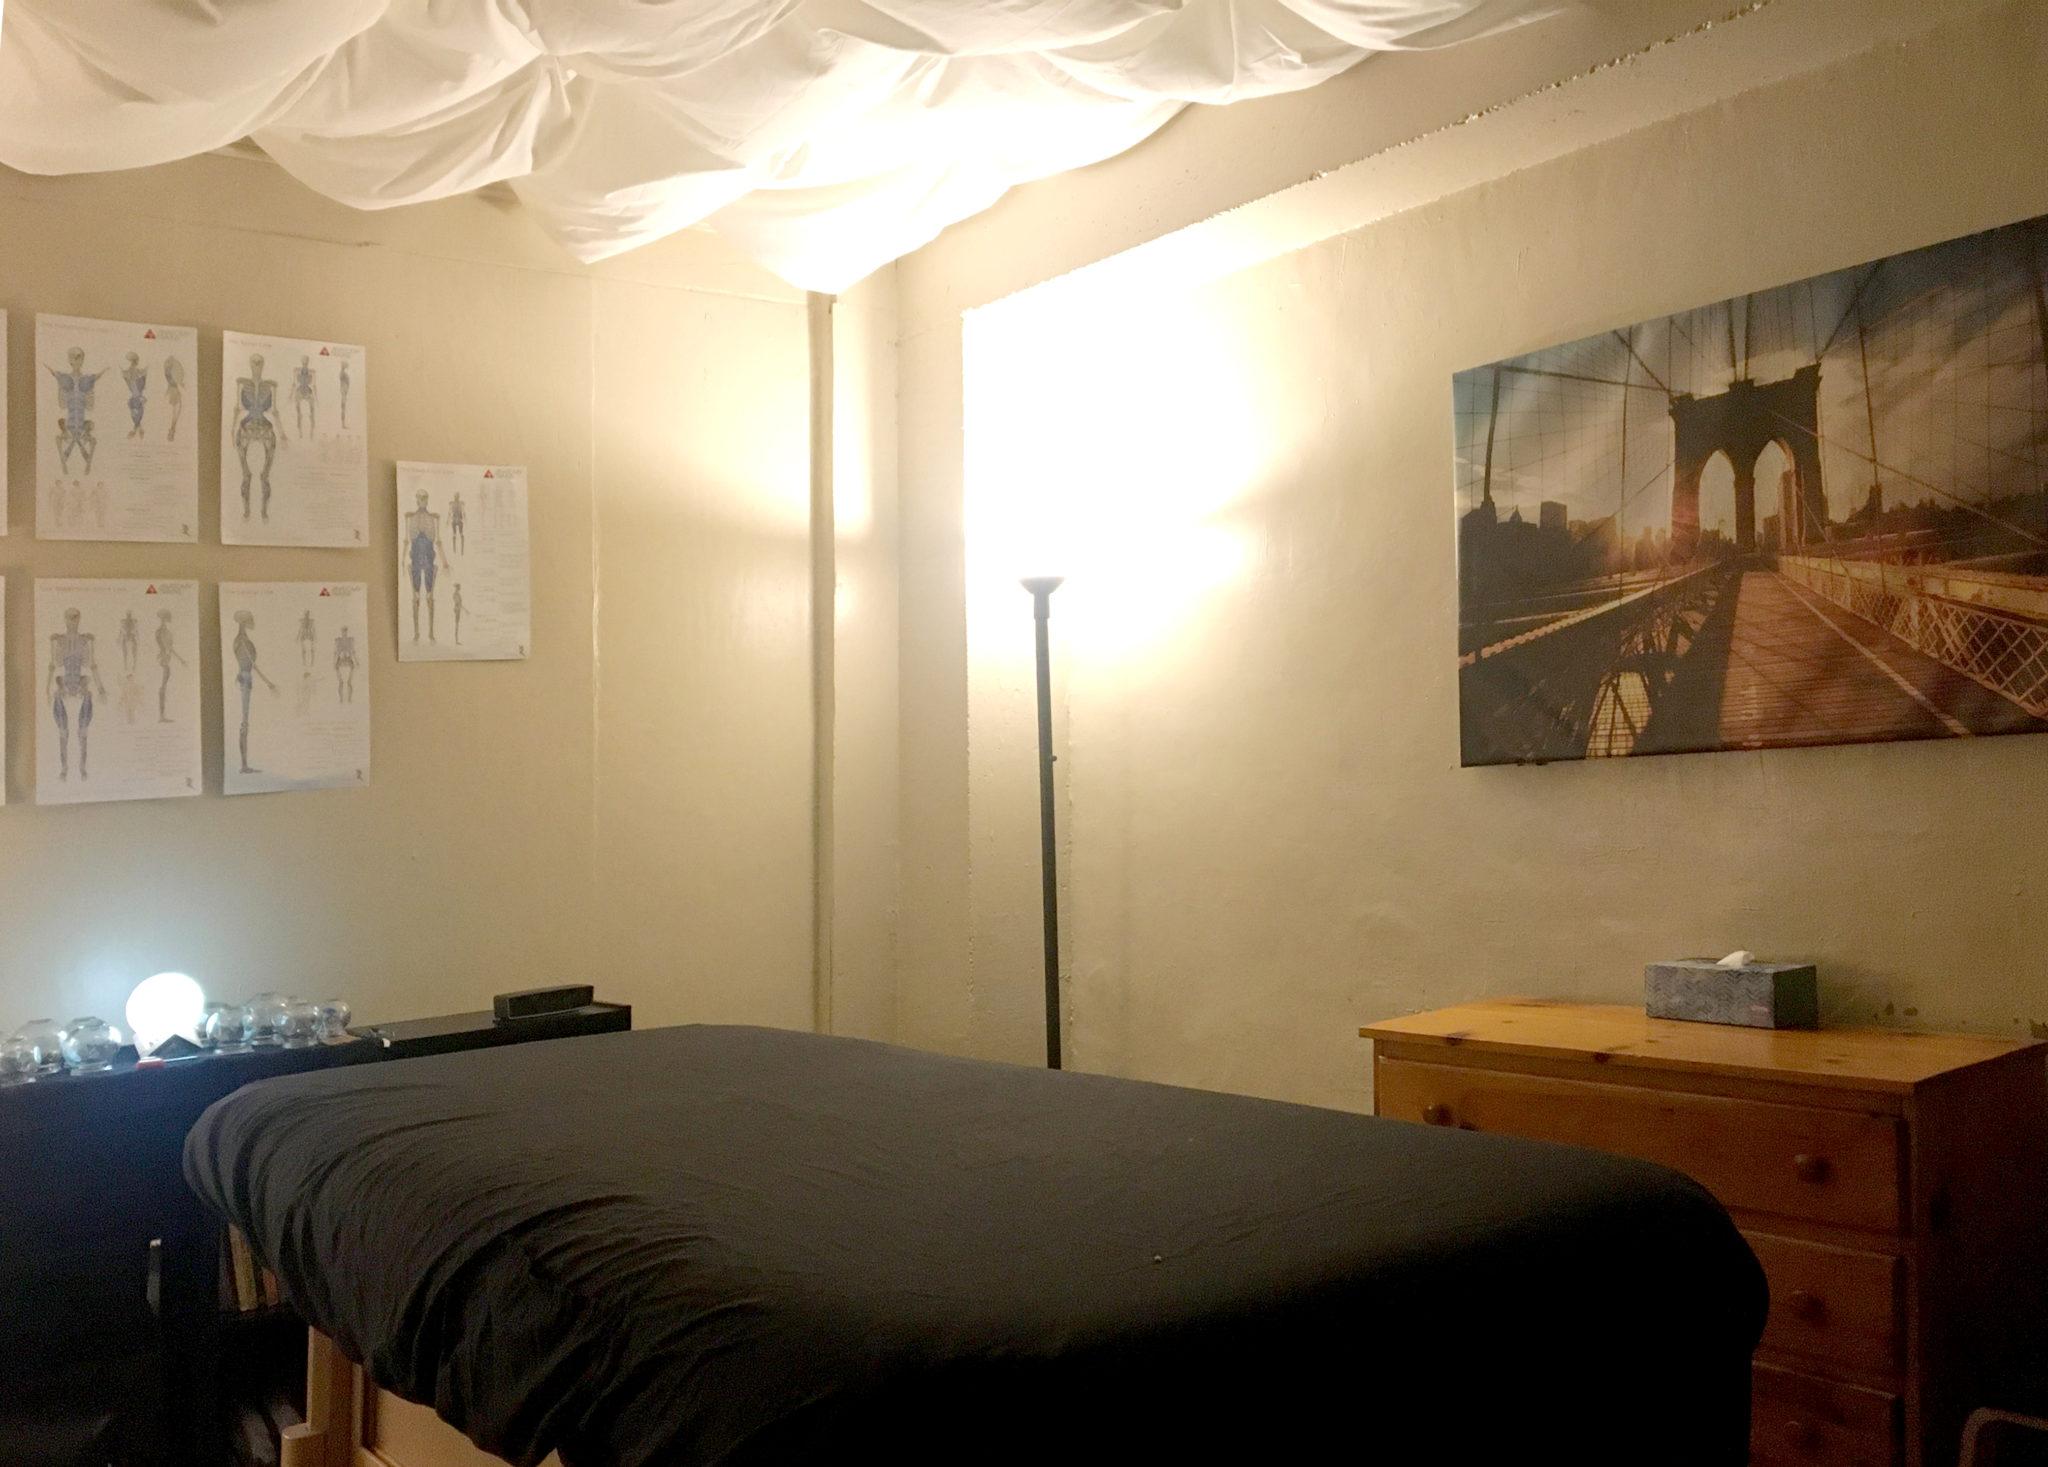 Tui Na massage therapy room